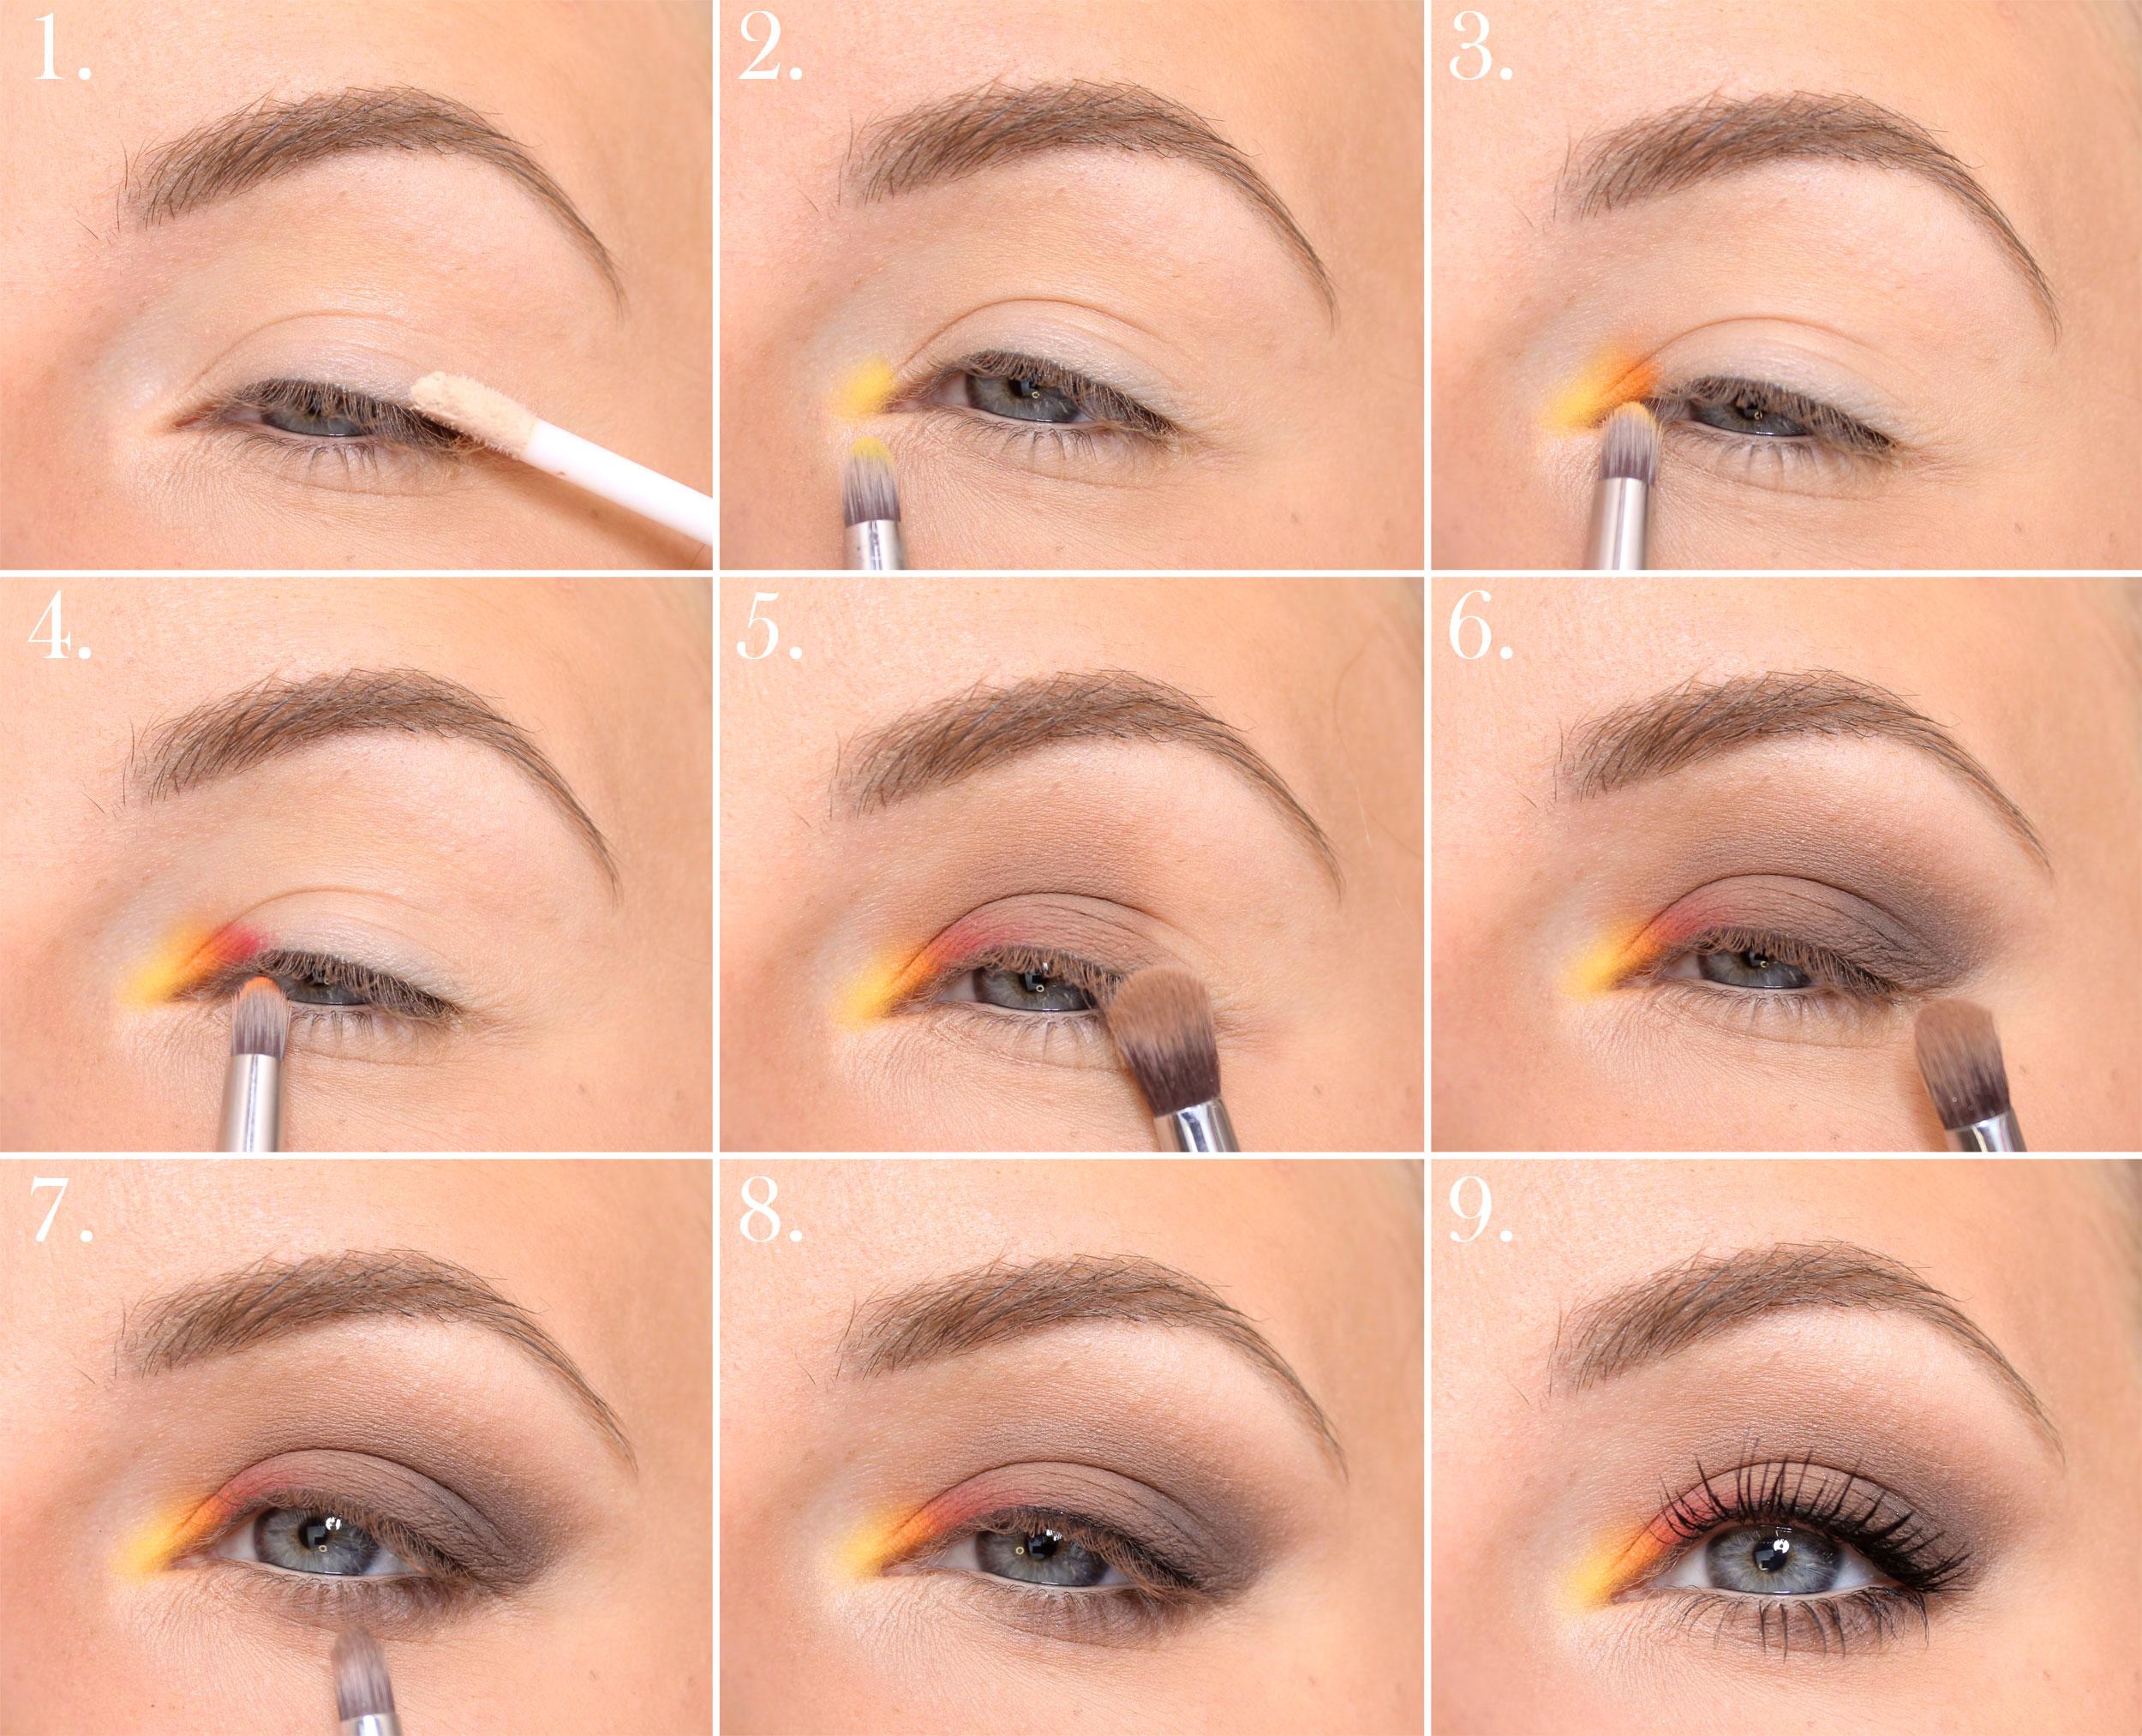 maquillaje de otoño paso a paso